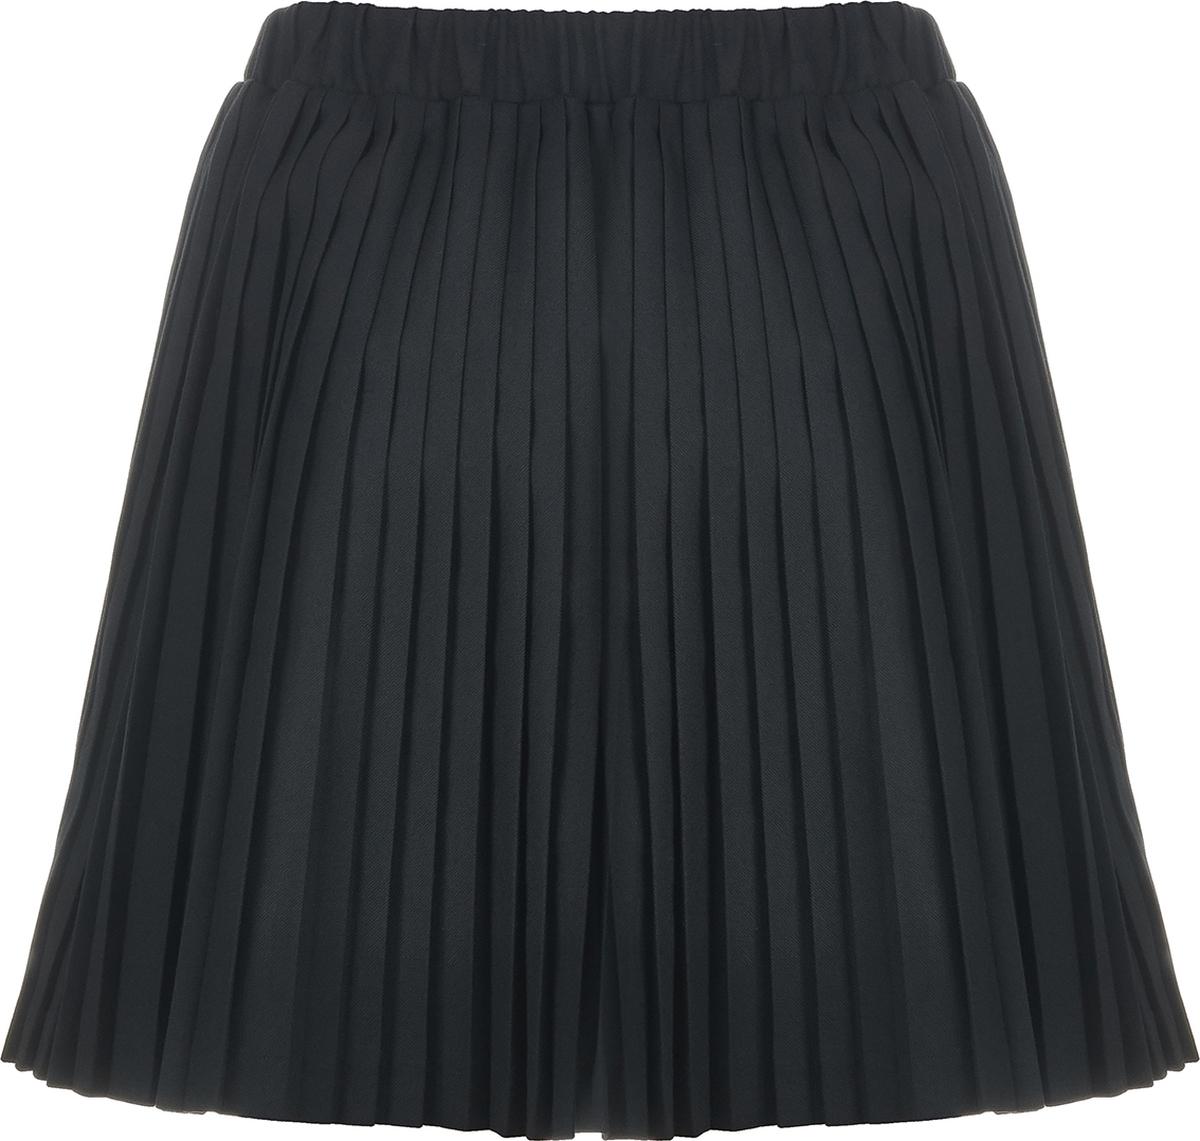 Юбка для девочки Button Blue, цвет: черный. 218BBGS61020800. Размер 152 Button Blue